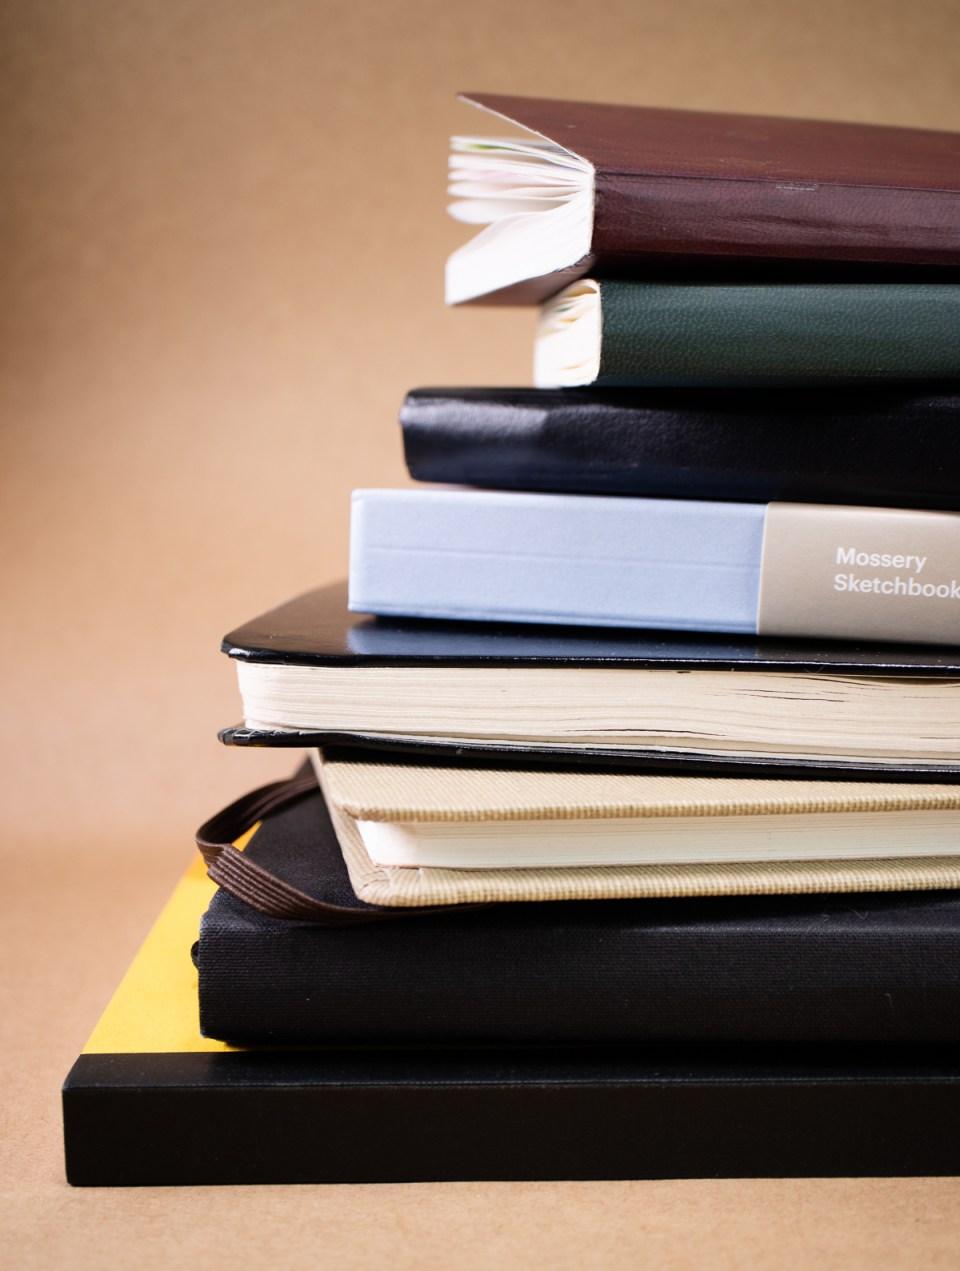 Eight sketchbooks reviewed